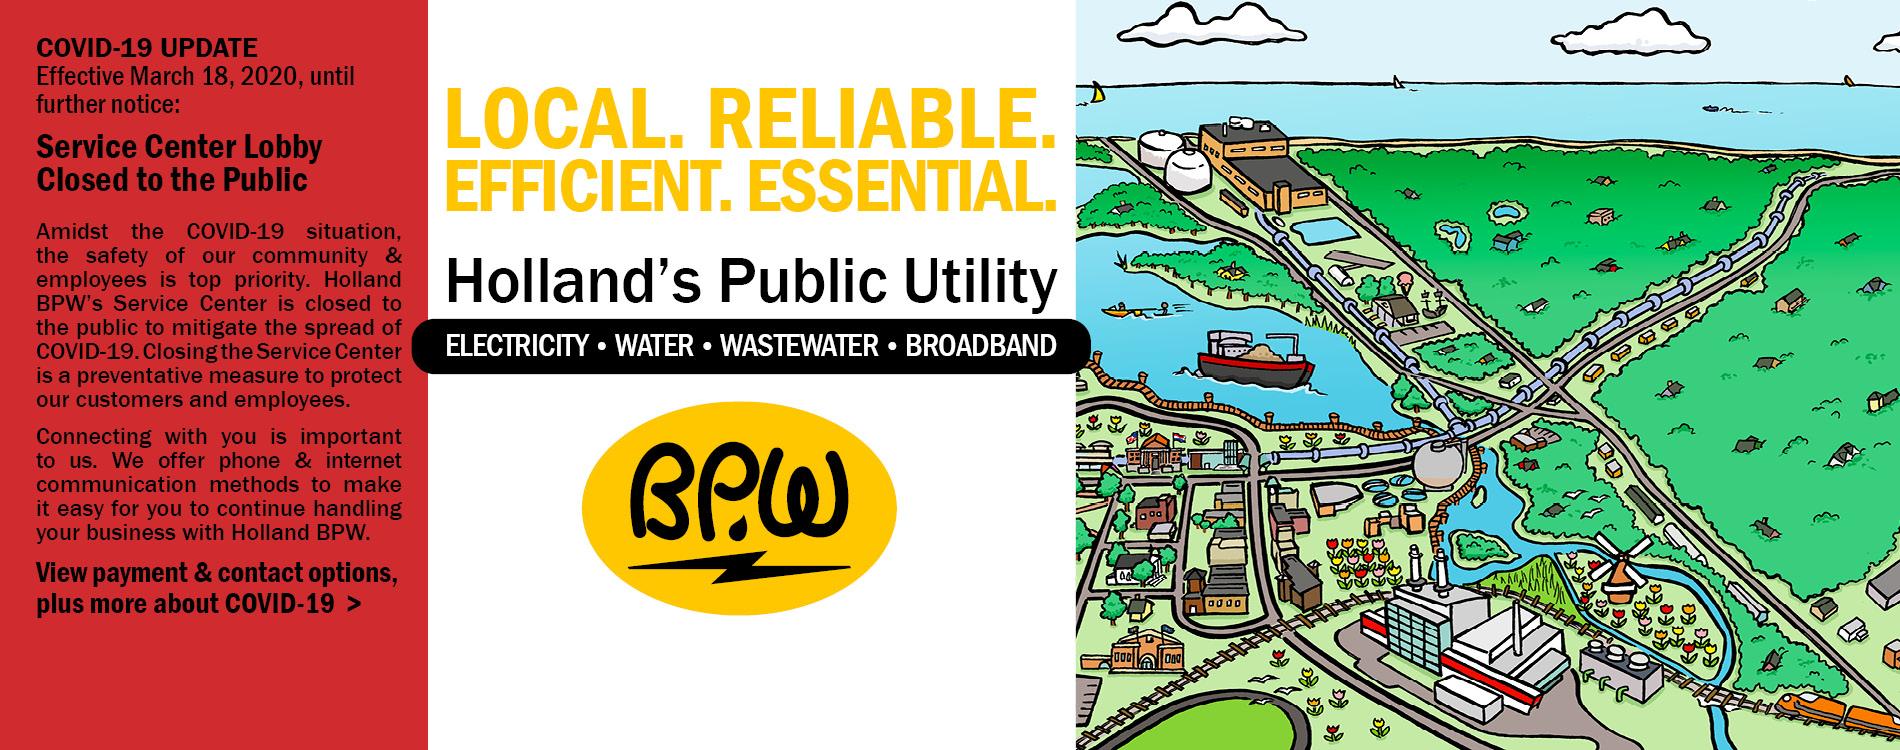 Best paying jobs in public utilities